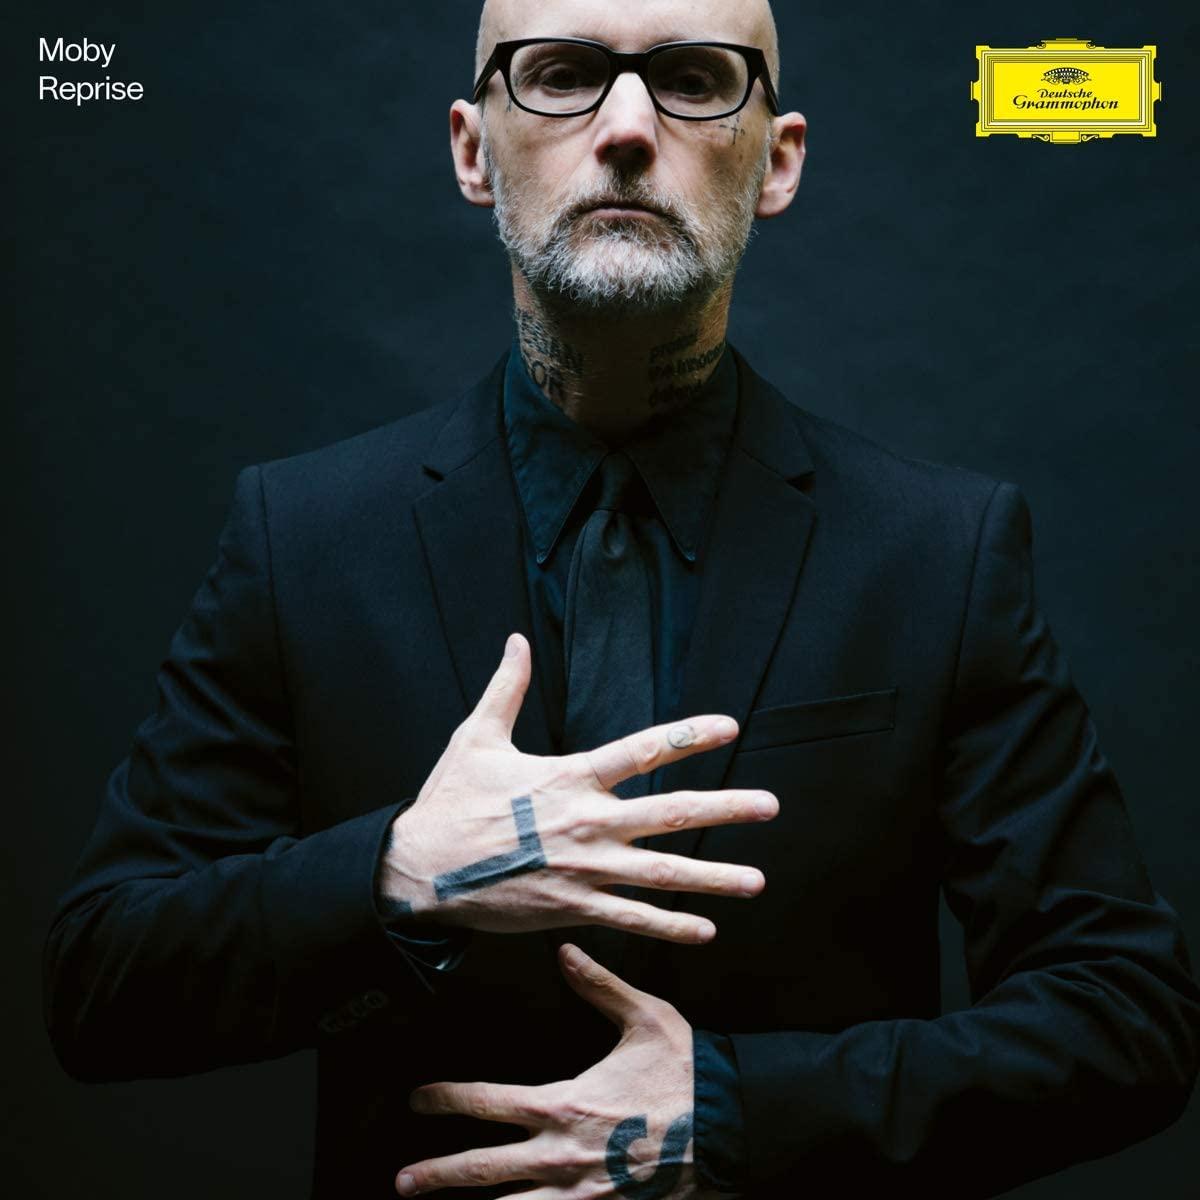 Copertina Vinile 33 giri Reprise [2 LP] di Moby